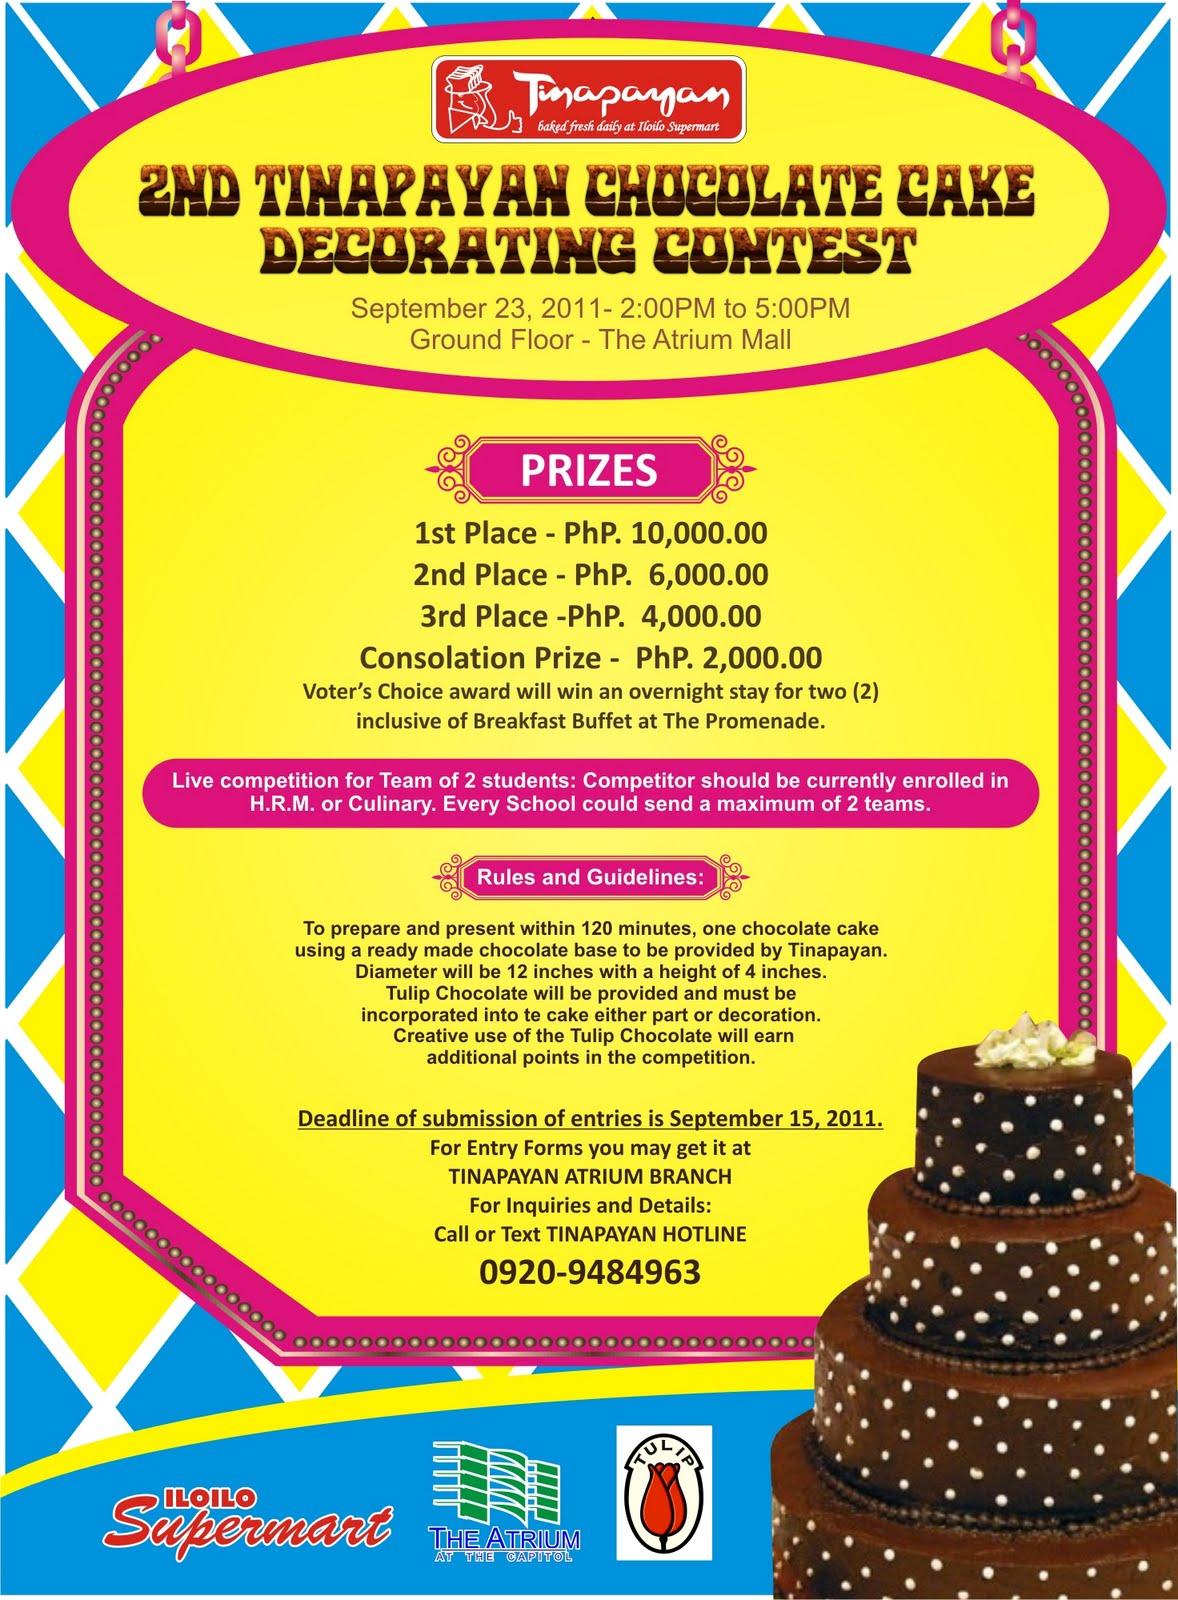 Tinapayan Chocolate Cake Decorating Contest 2011 ...